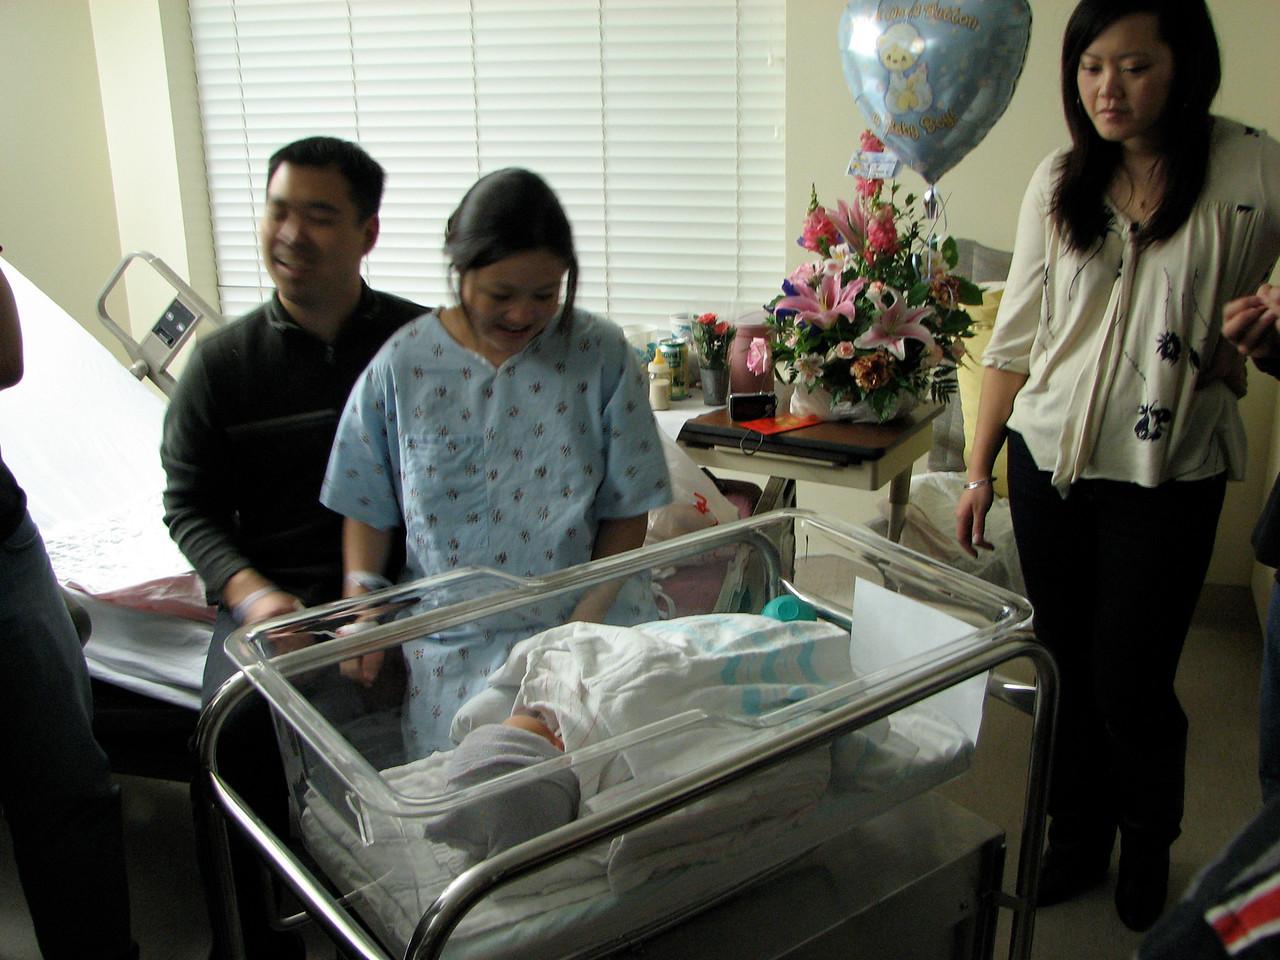 2007 03 23 Fri - Harry, Cathy, & Joshua Huang, and Maggie Yang 1